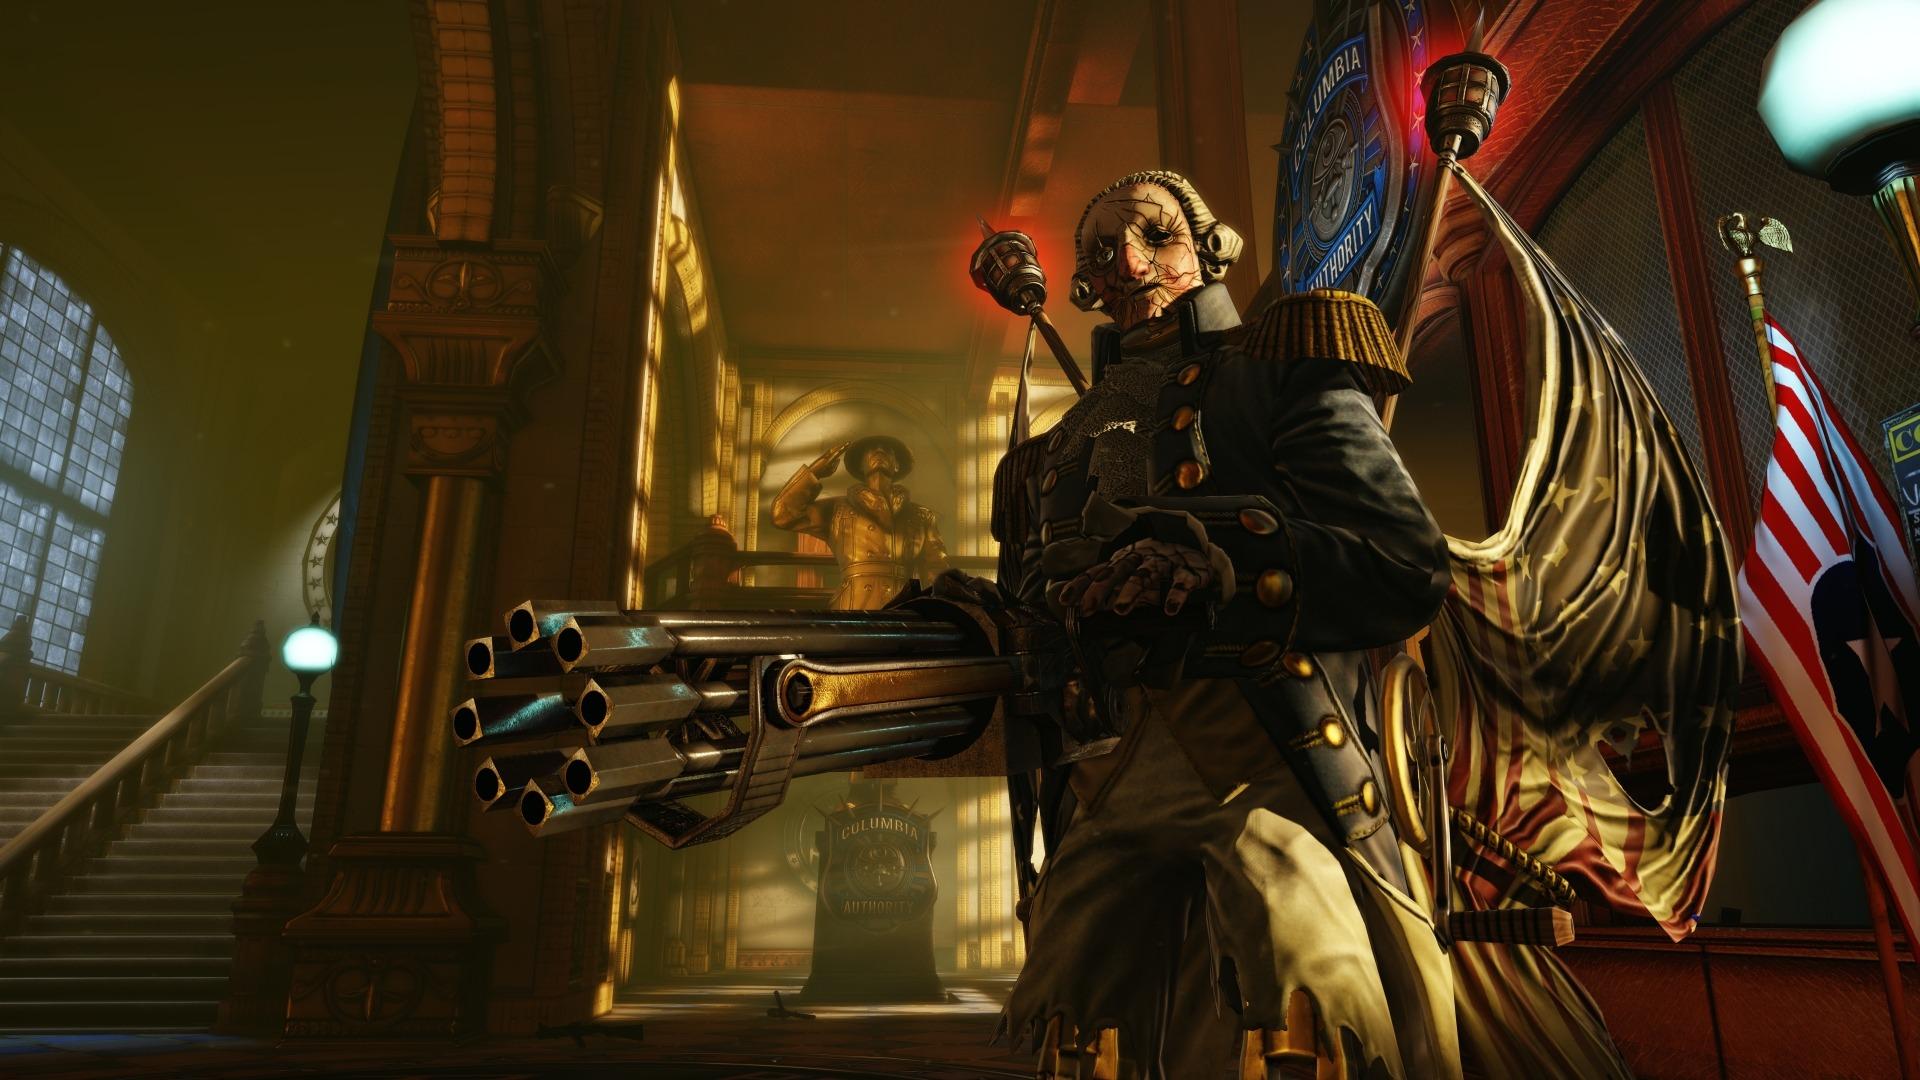 BioShock Infinite game image